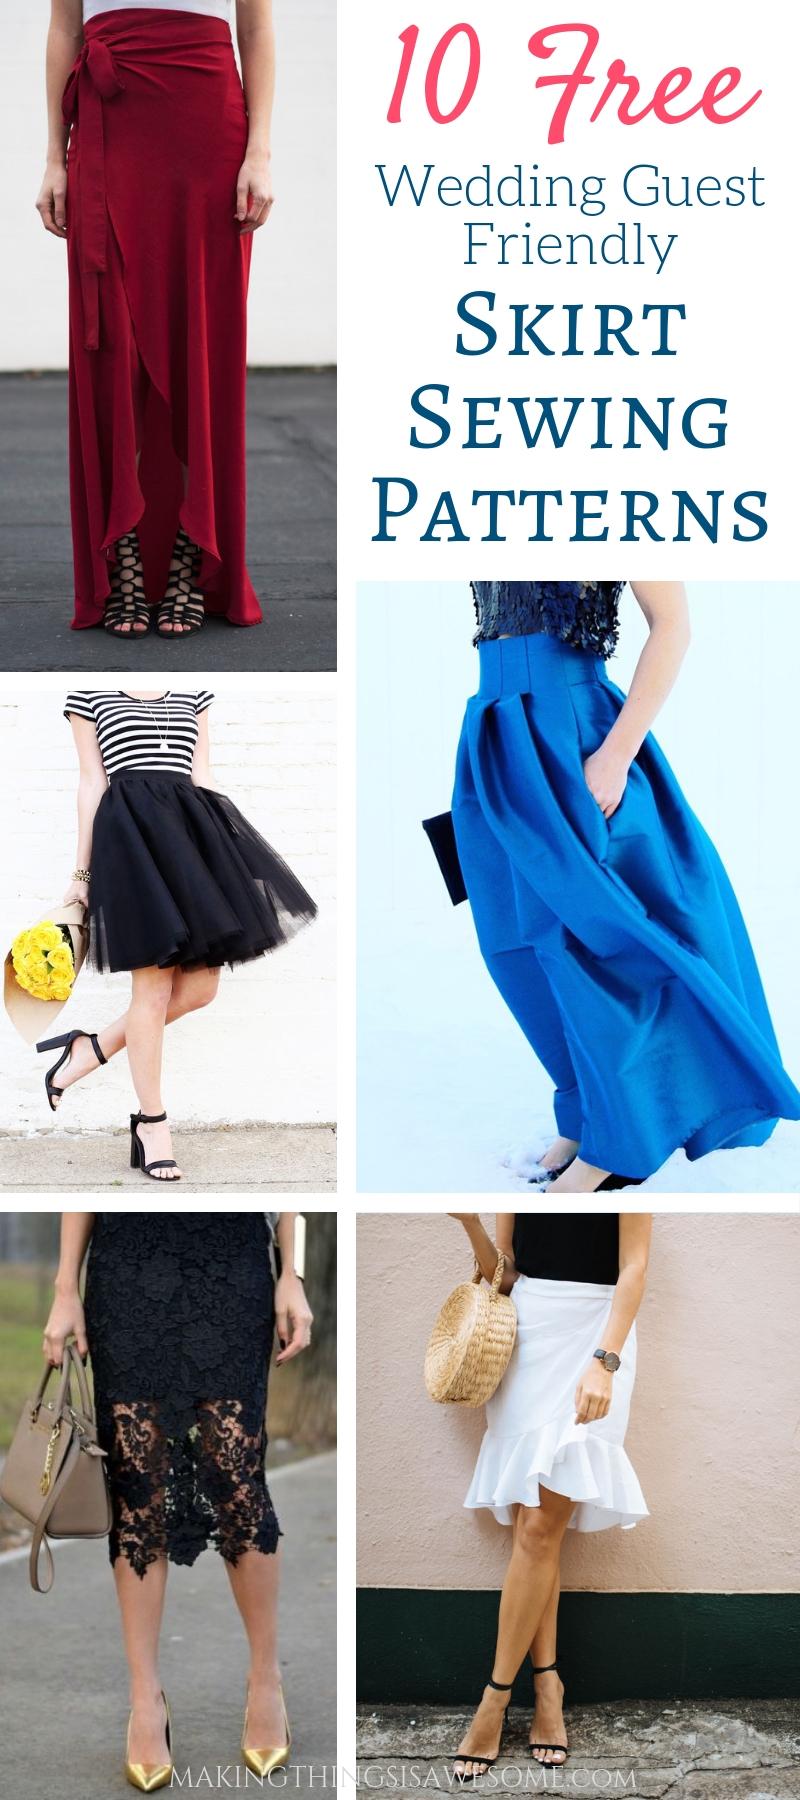 10 Free DIY Skirt Sewing Patterns - Wedding Guest Friendly Skirts! - pin